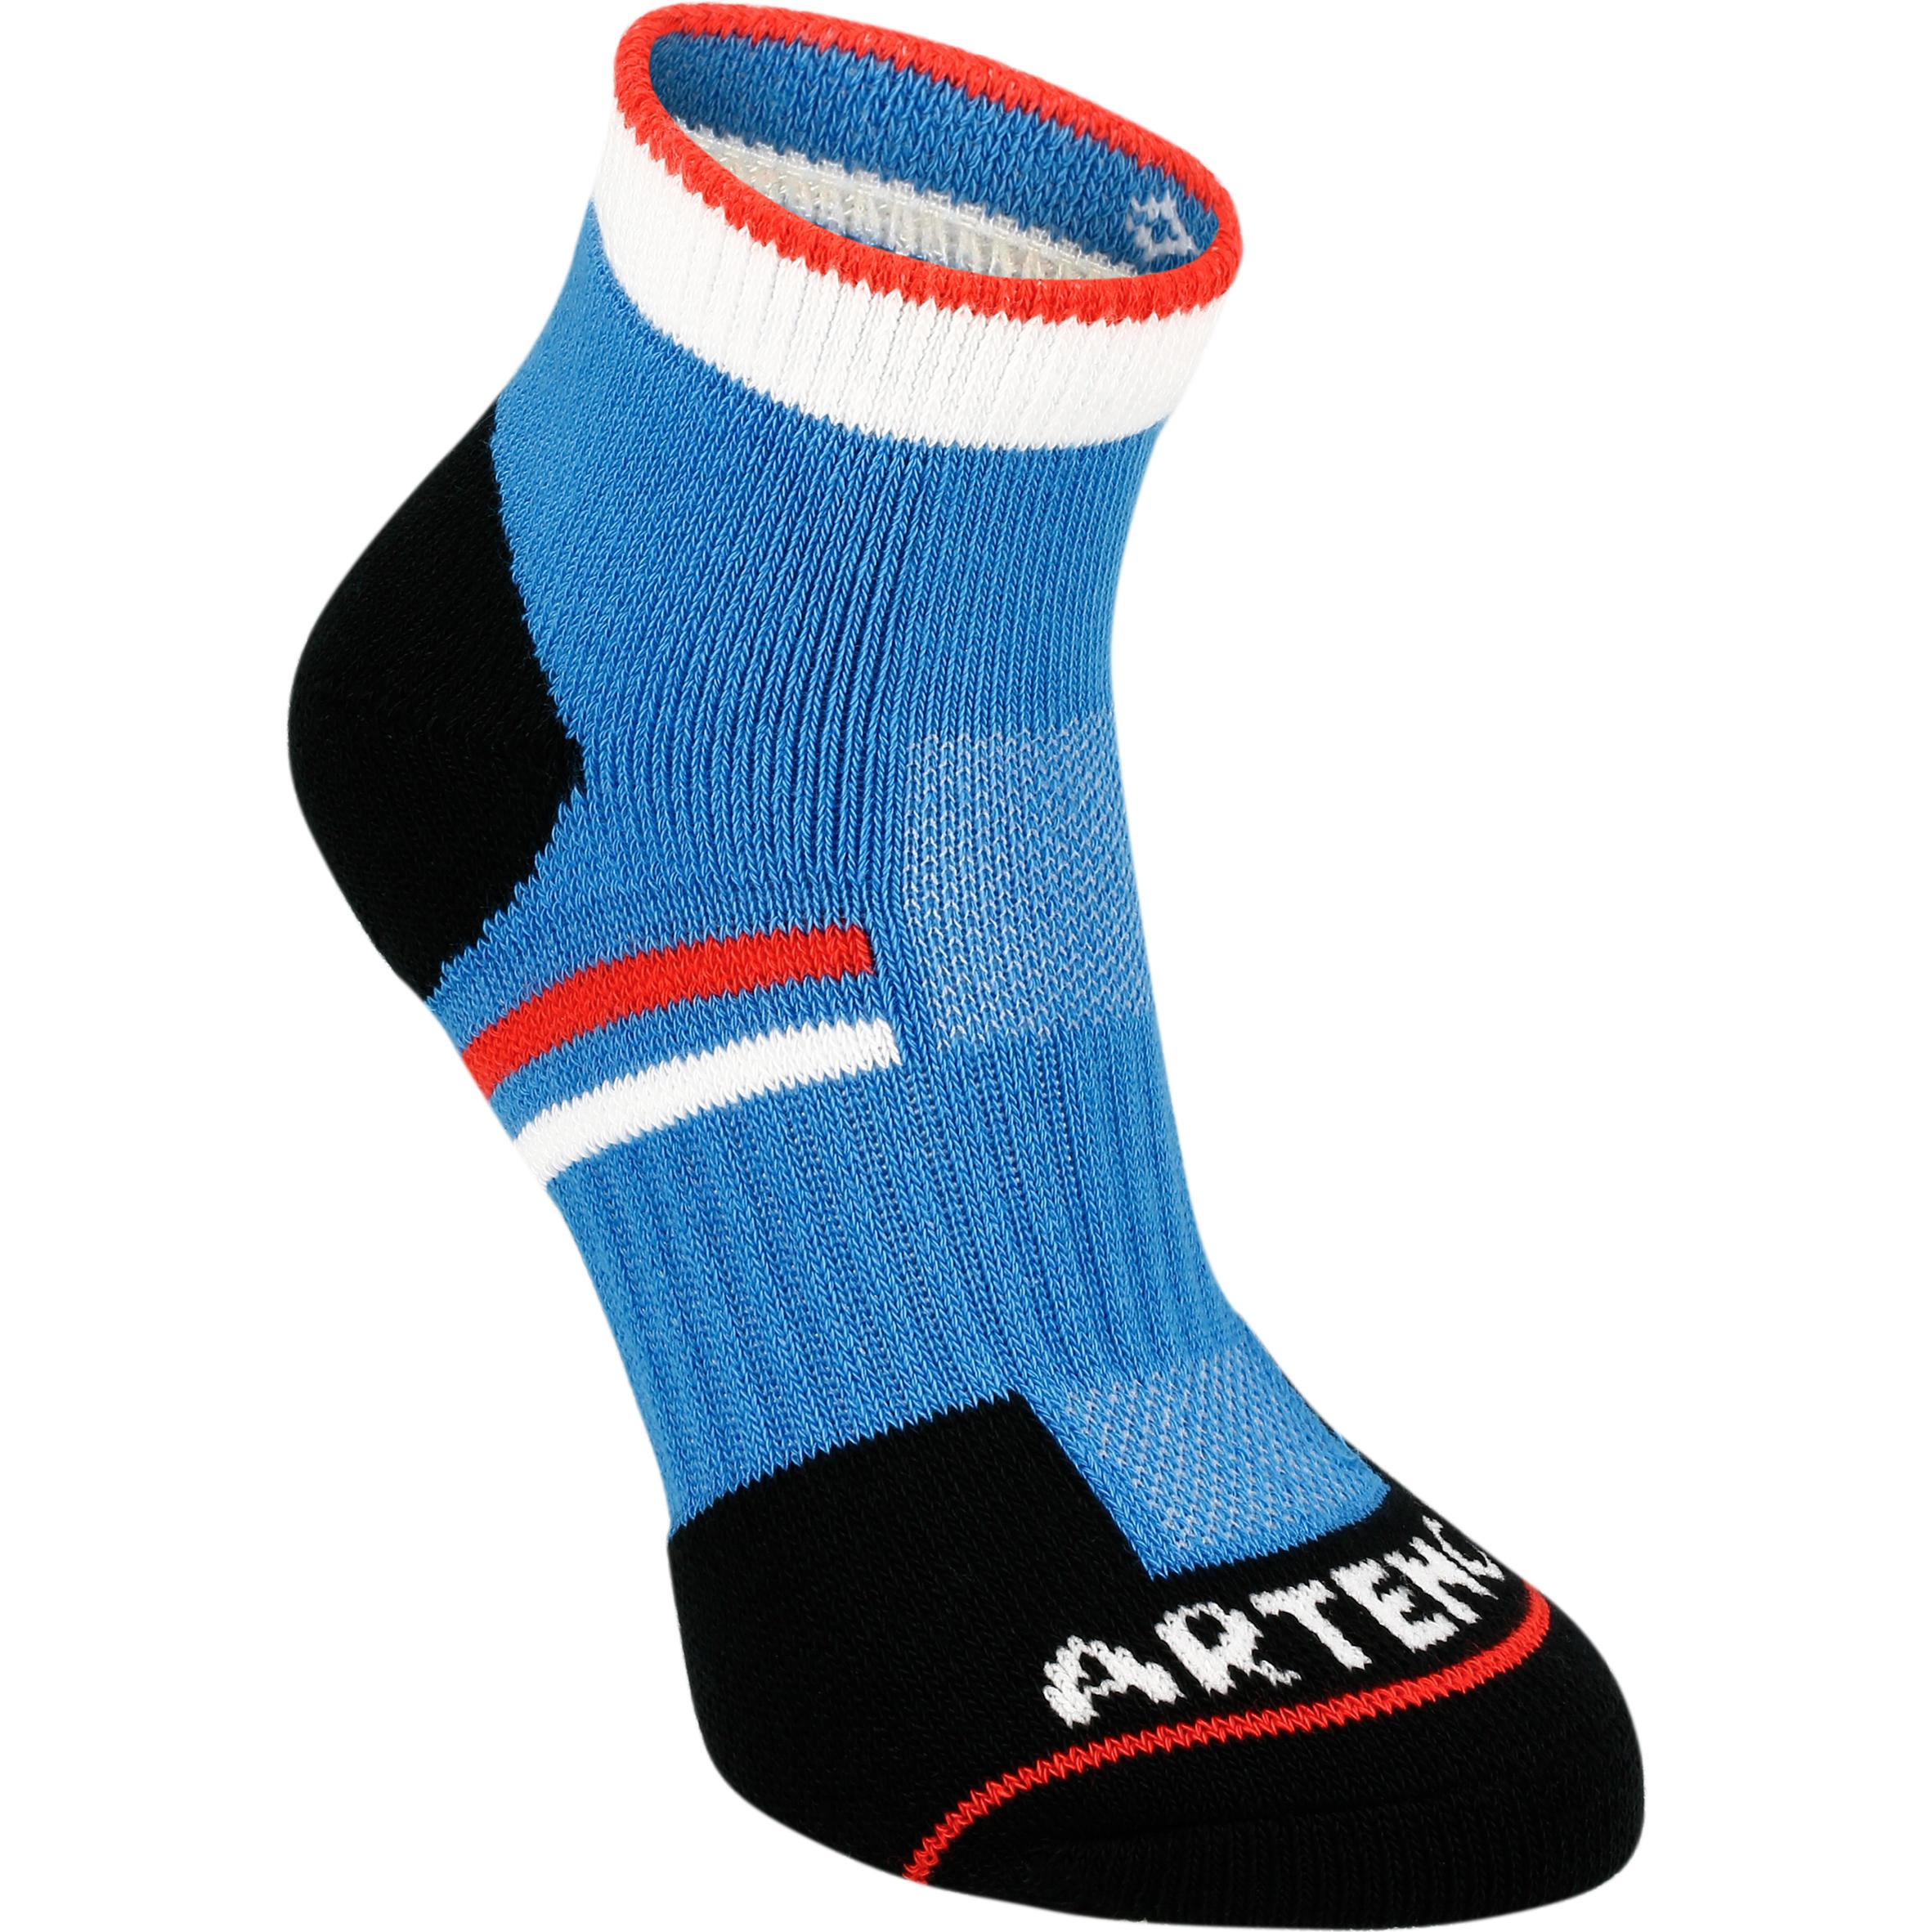 Junior Socks Mid Length - RS 500 Tri pack